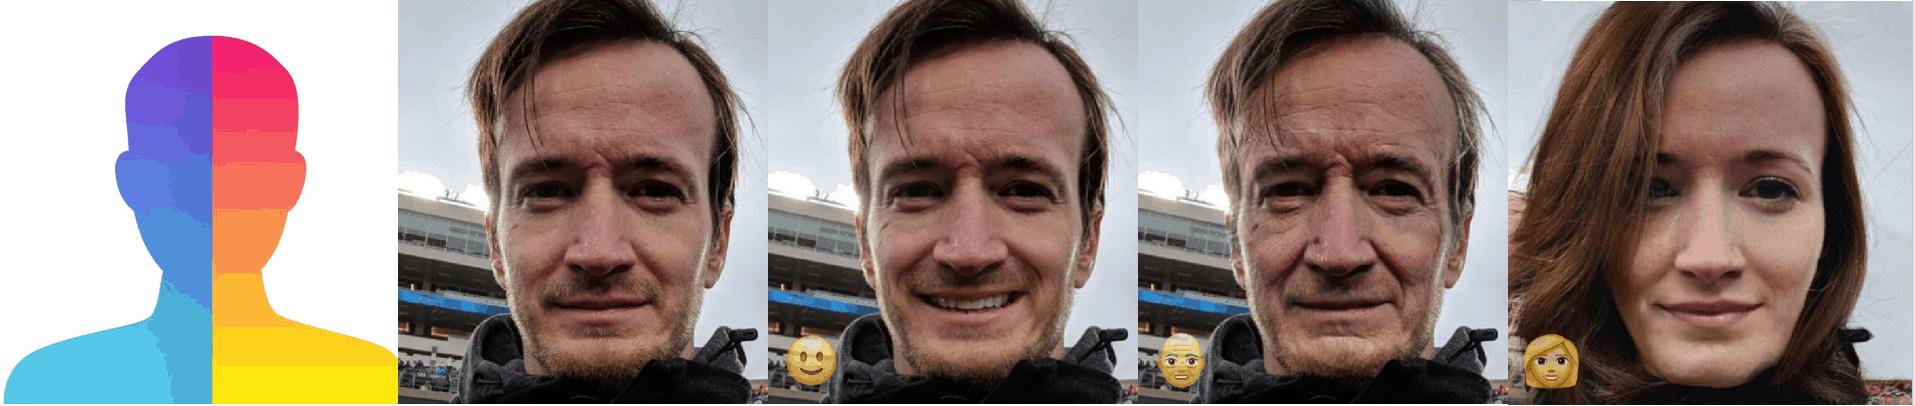 faceapp example